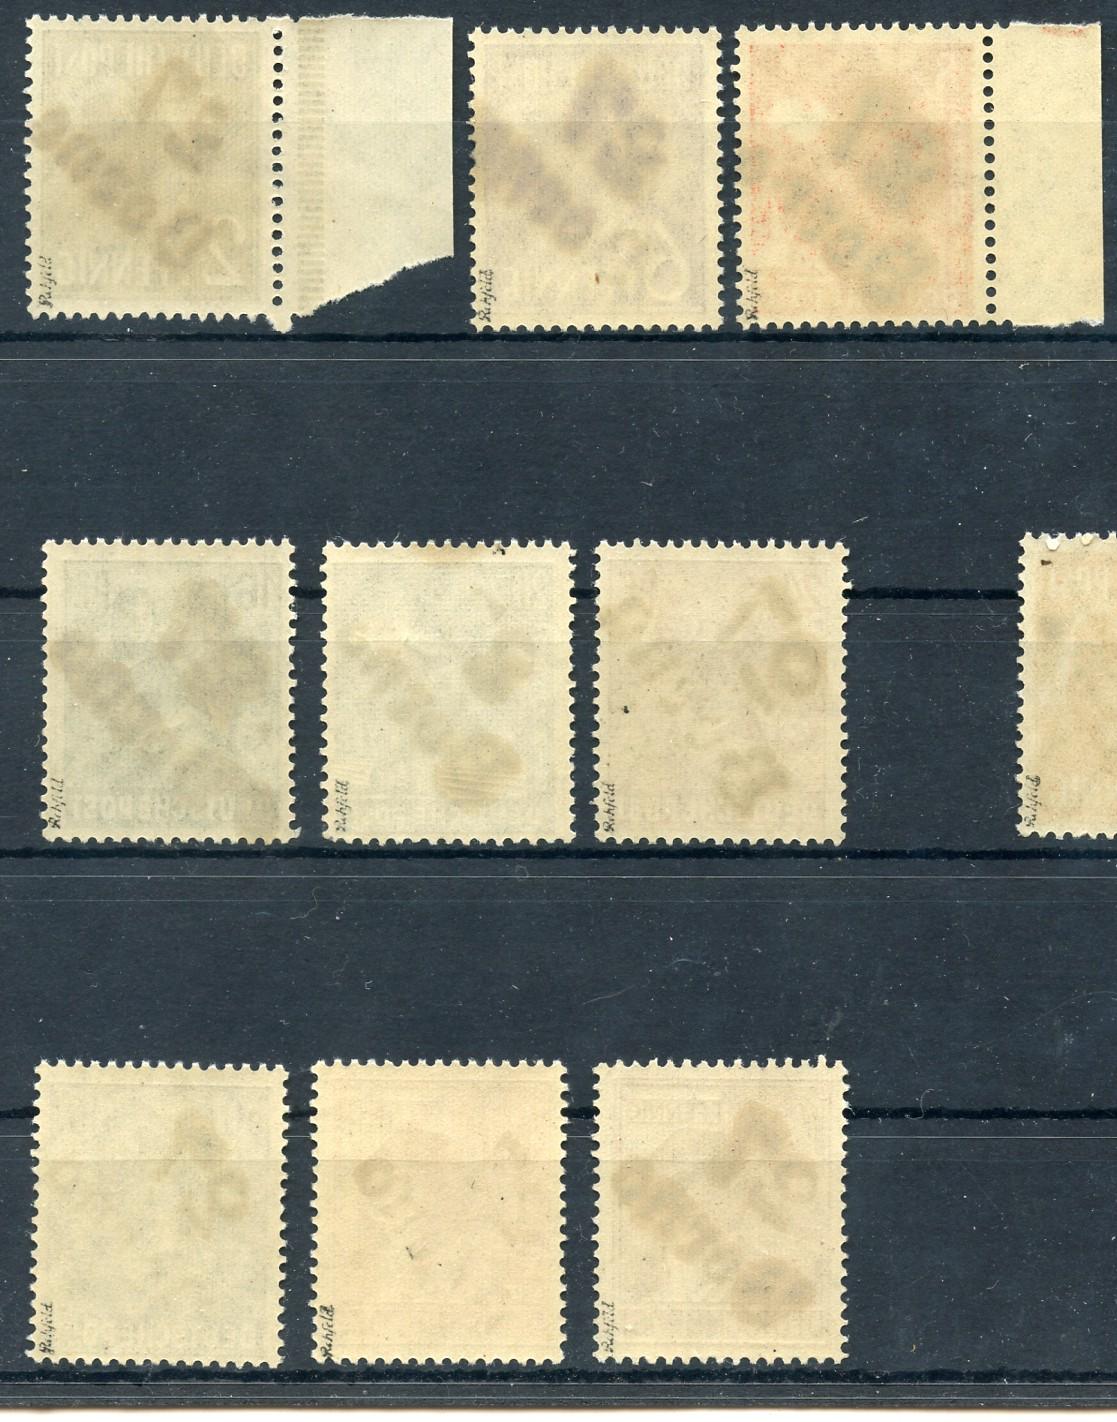 sbz bezirksstempel satz opd leipzig bezirk 27 alle gepr ft bilder im angebot ebay. Black Bedroom Furniture Sets. Home Design Ideas